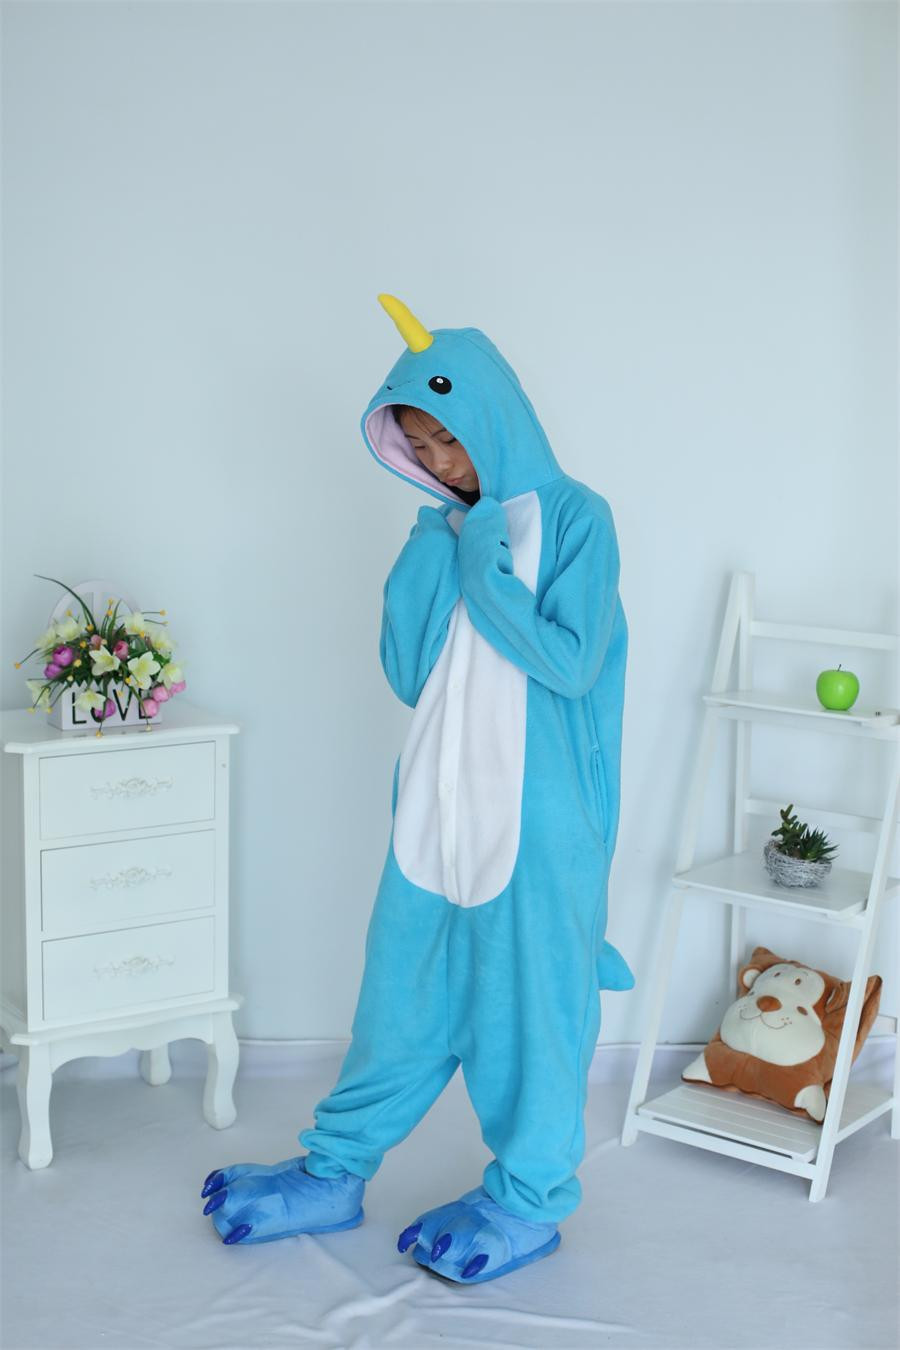 Cosplay Costume Sleepwear Pyjamas Unisex Onesies Cartoon Sleepsuit Halloween Christmas New Adult Narwhal Pajamas Animal